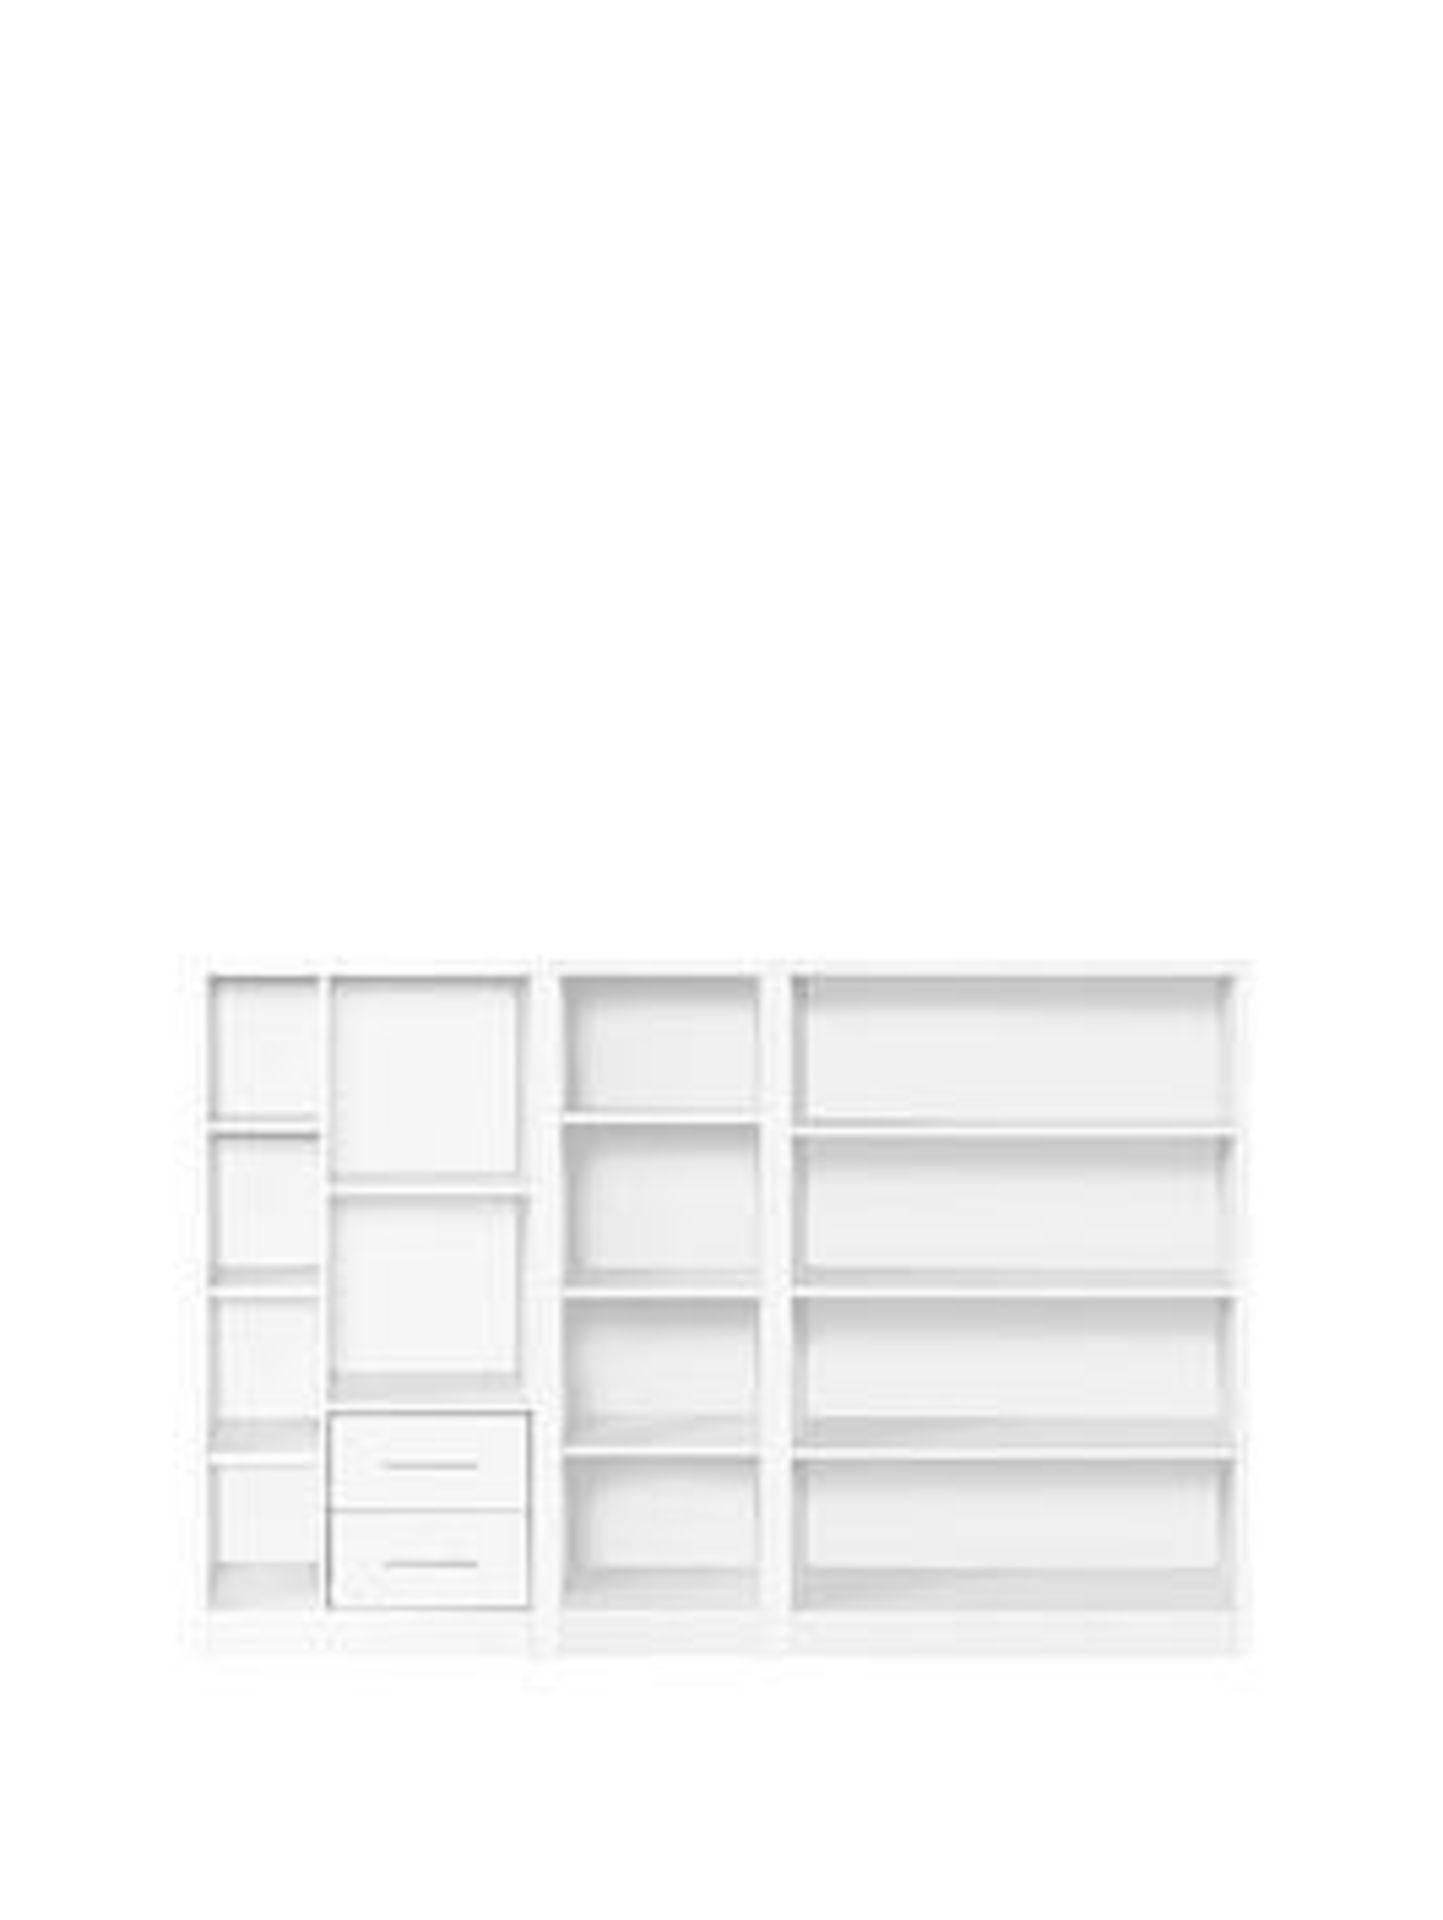 Lot 53 - Boxed Item Metro 3 Piece Bookcase [White] 121X79X30Cm rrp, £226.0